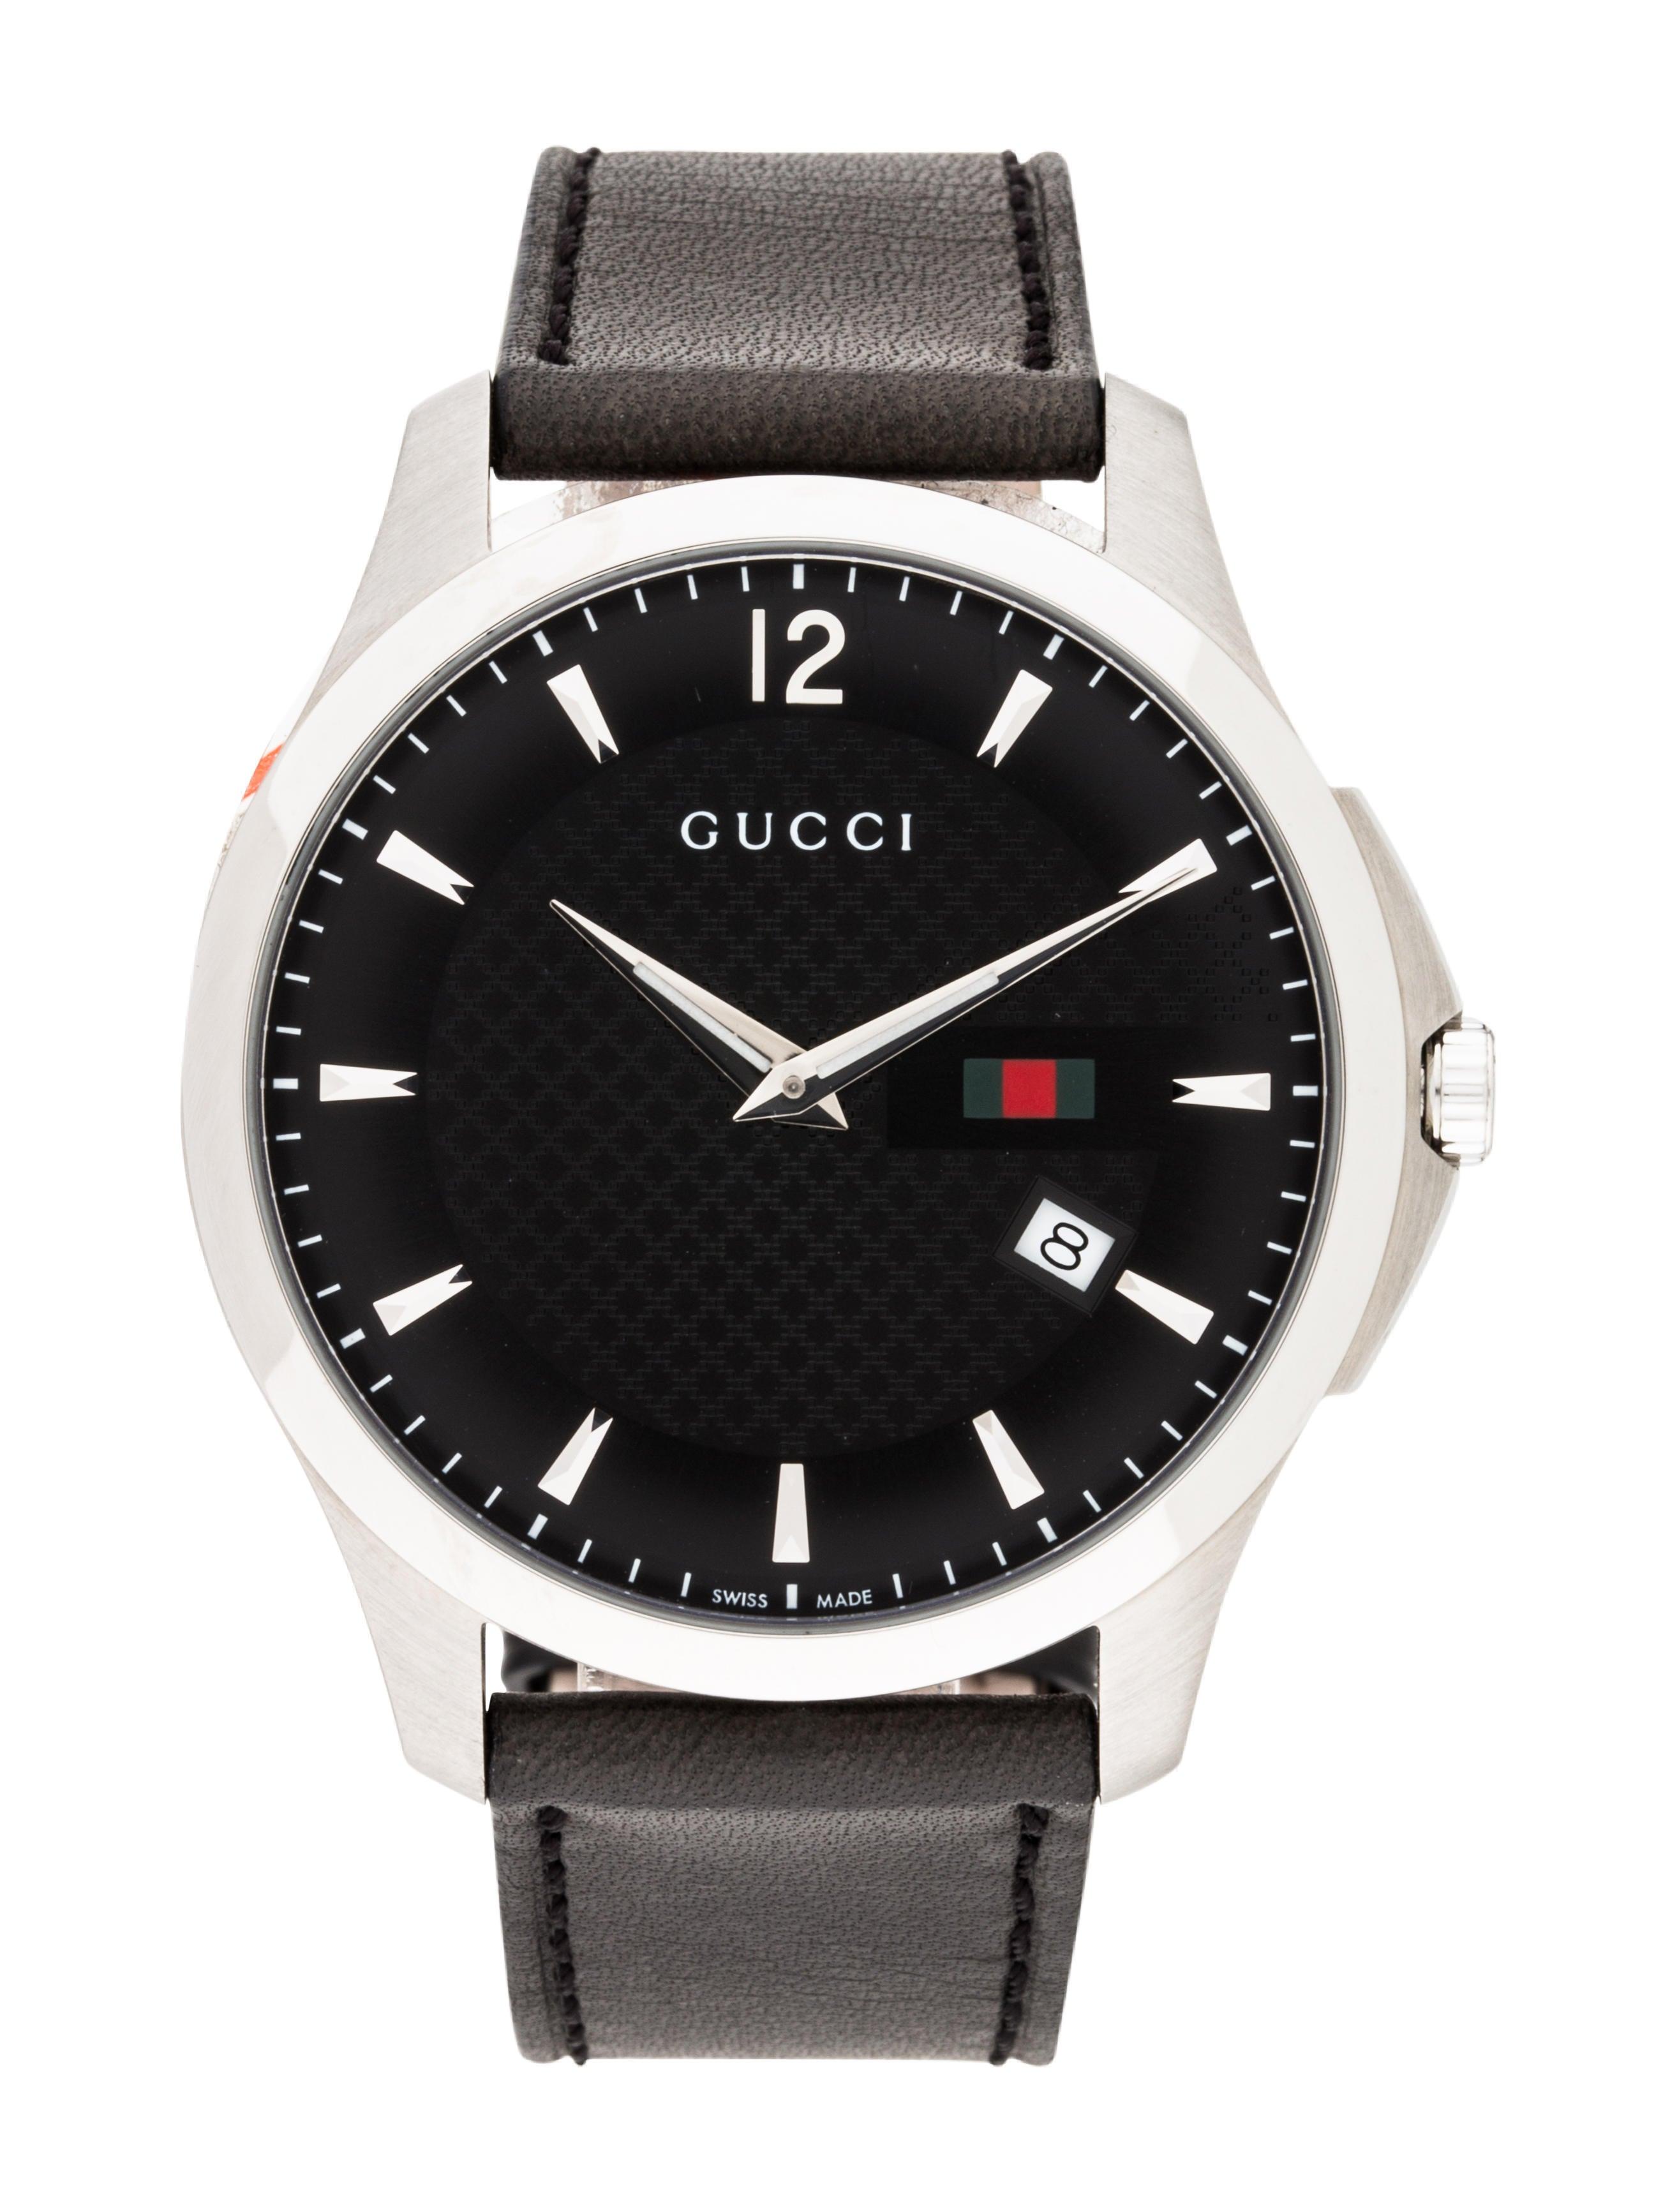 69fcd619094 Gucci G-Timeless Watch - Strap - GUC235320